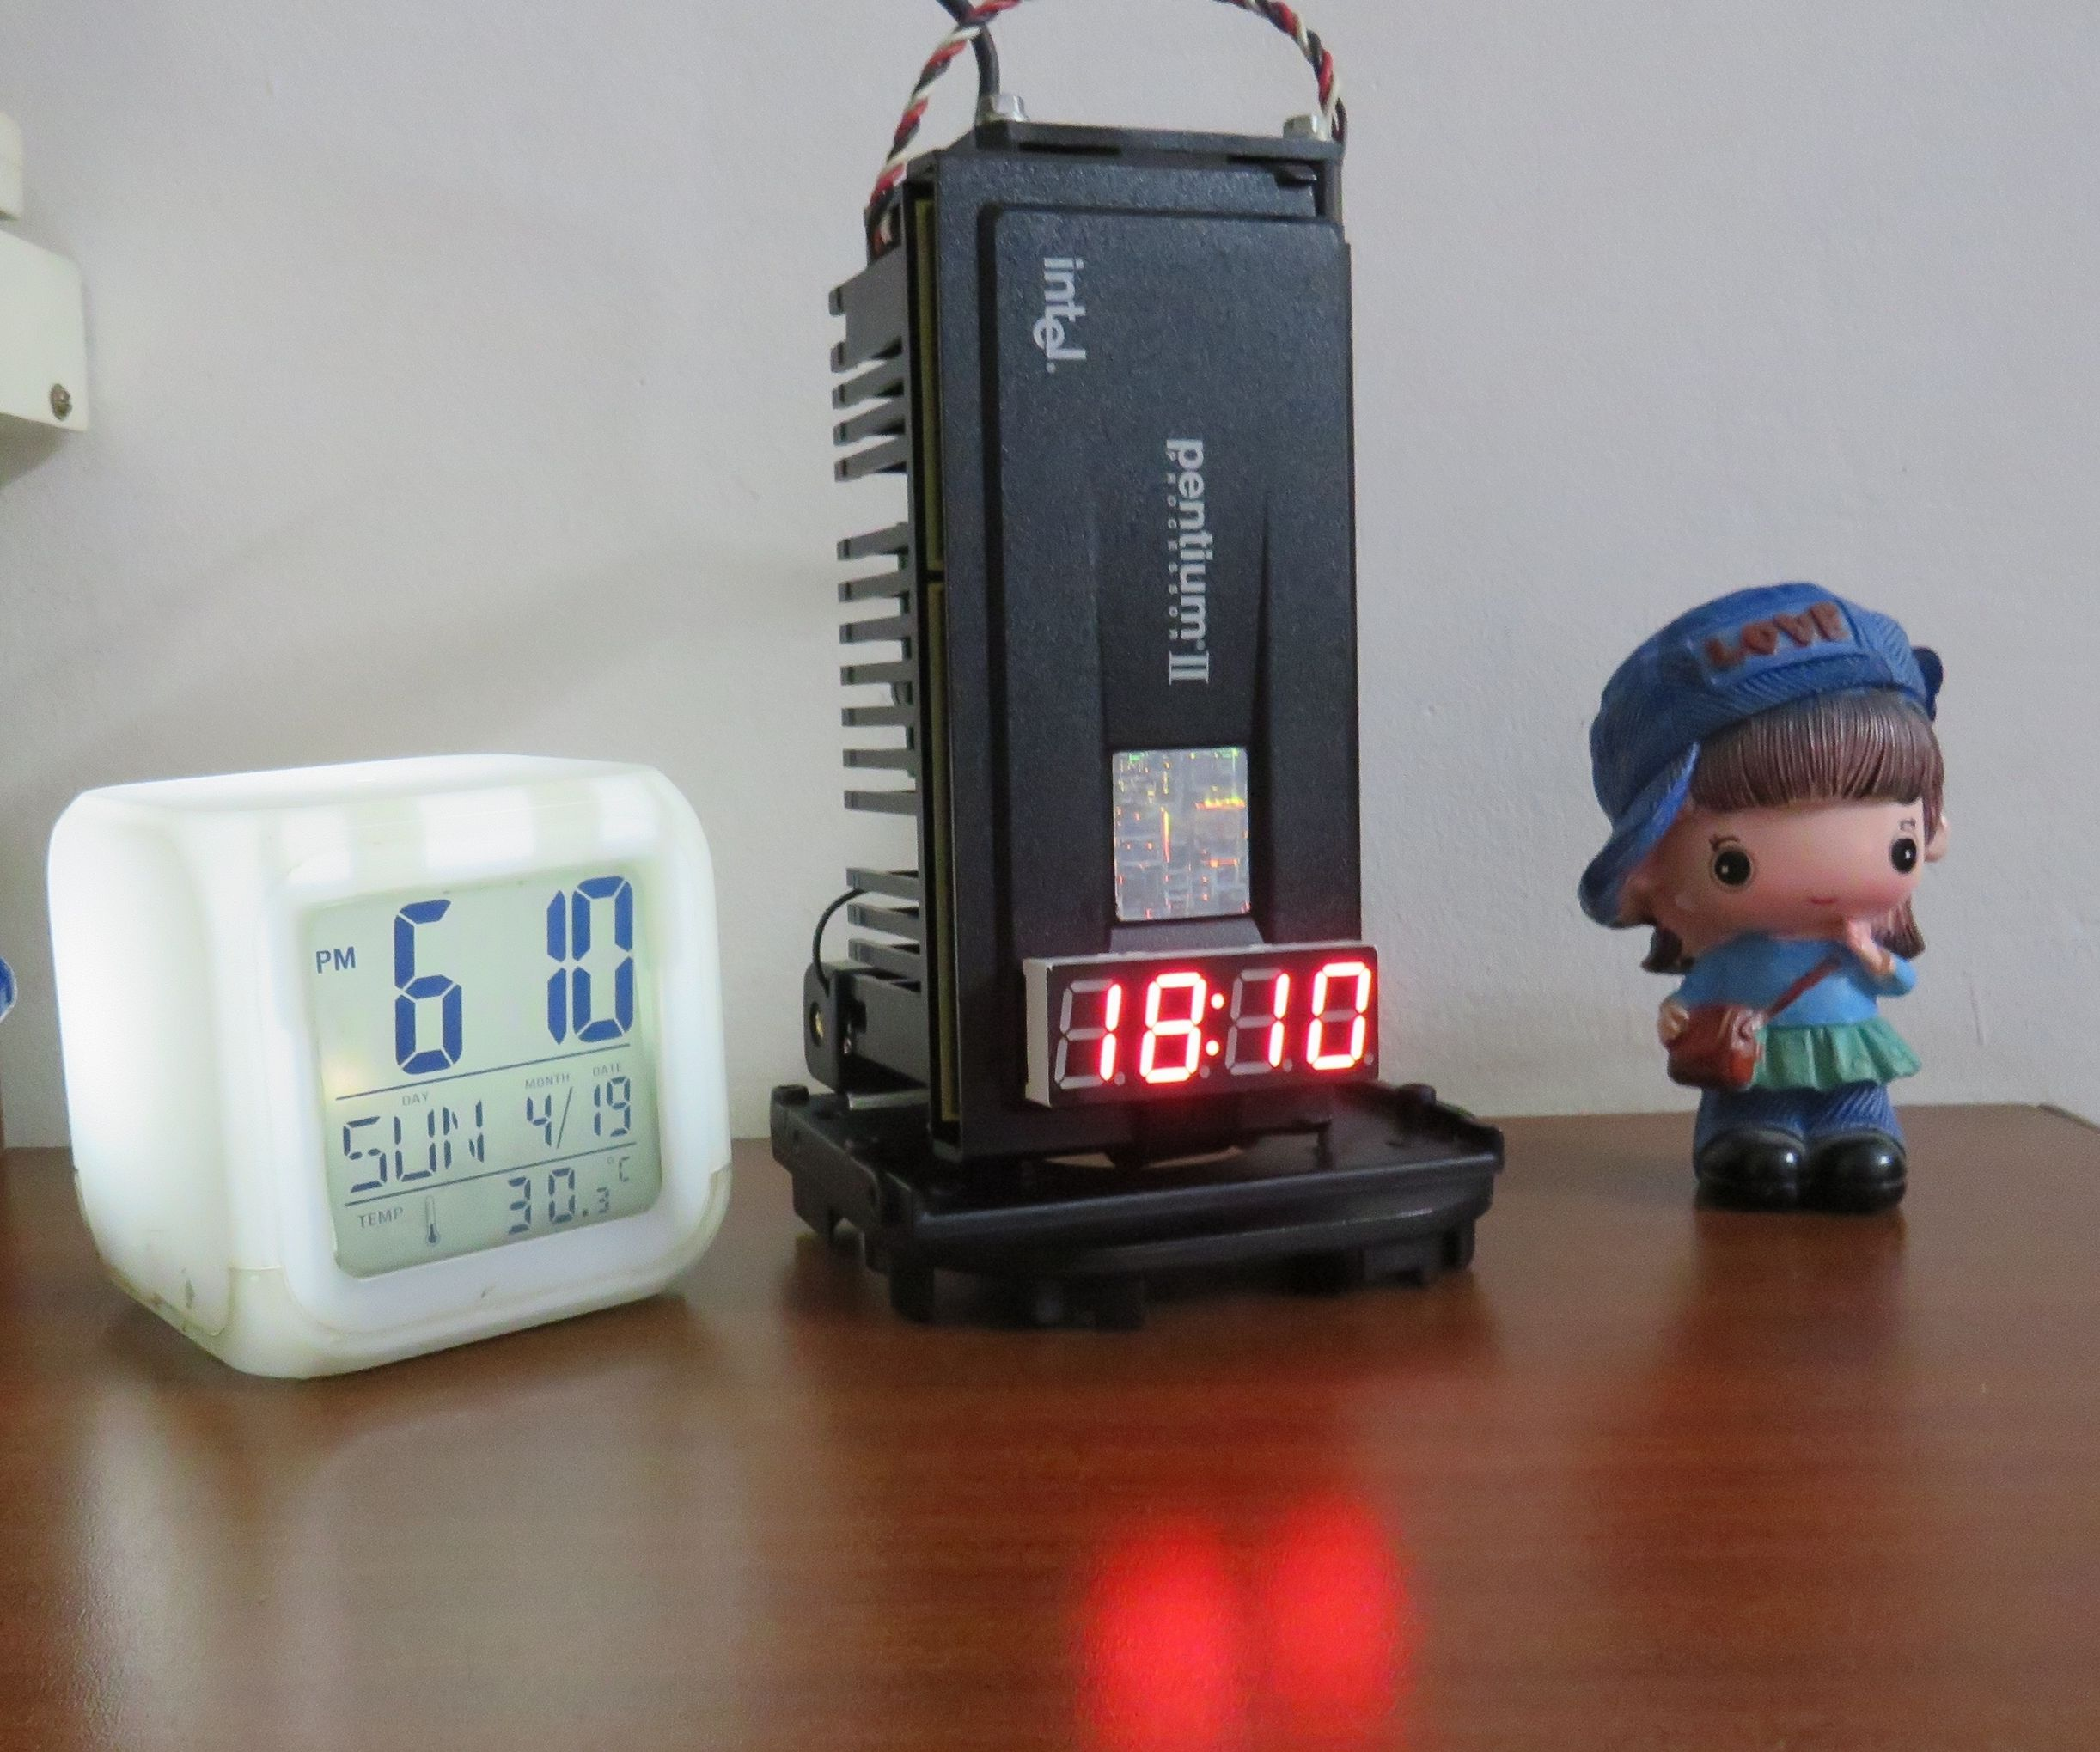 Time Bomb LED Clock Using Old Intel Pentium II Processor